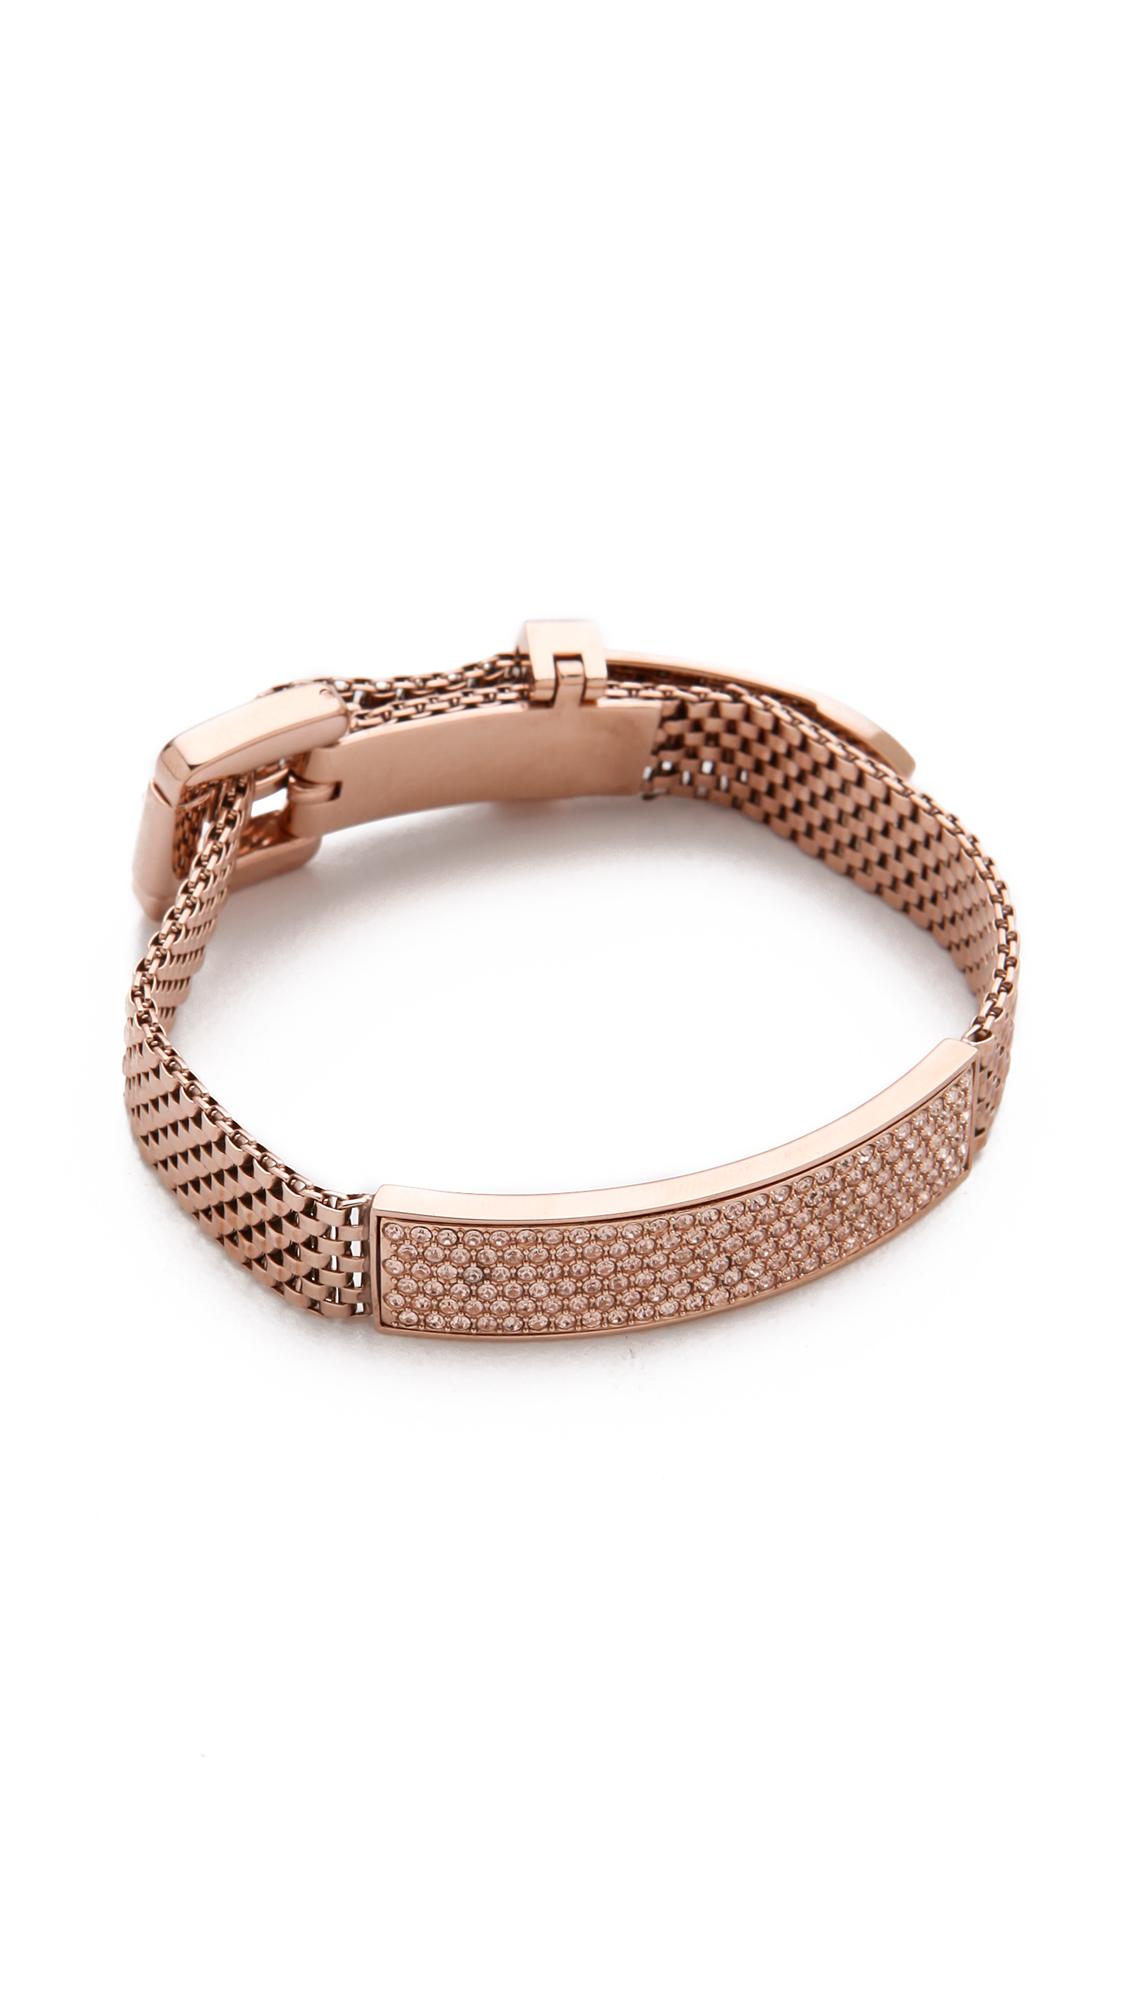 michael kors mesh pav bracelet in gold rose lyst. Black Bedroom Furniture Sets. Home Design Ideas